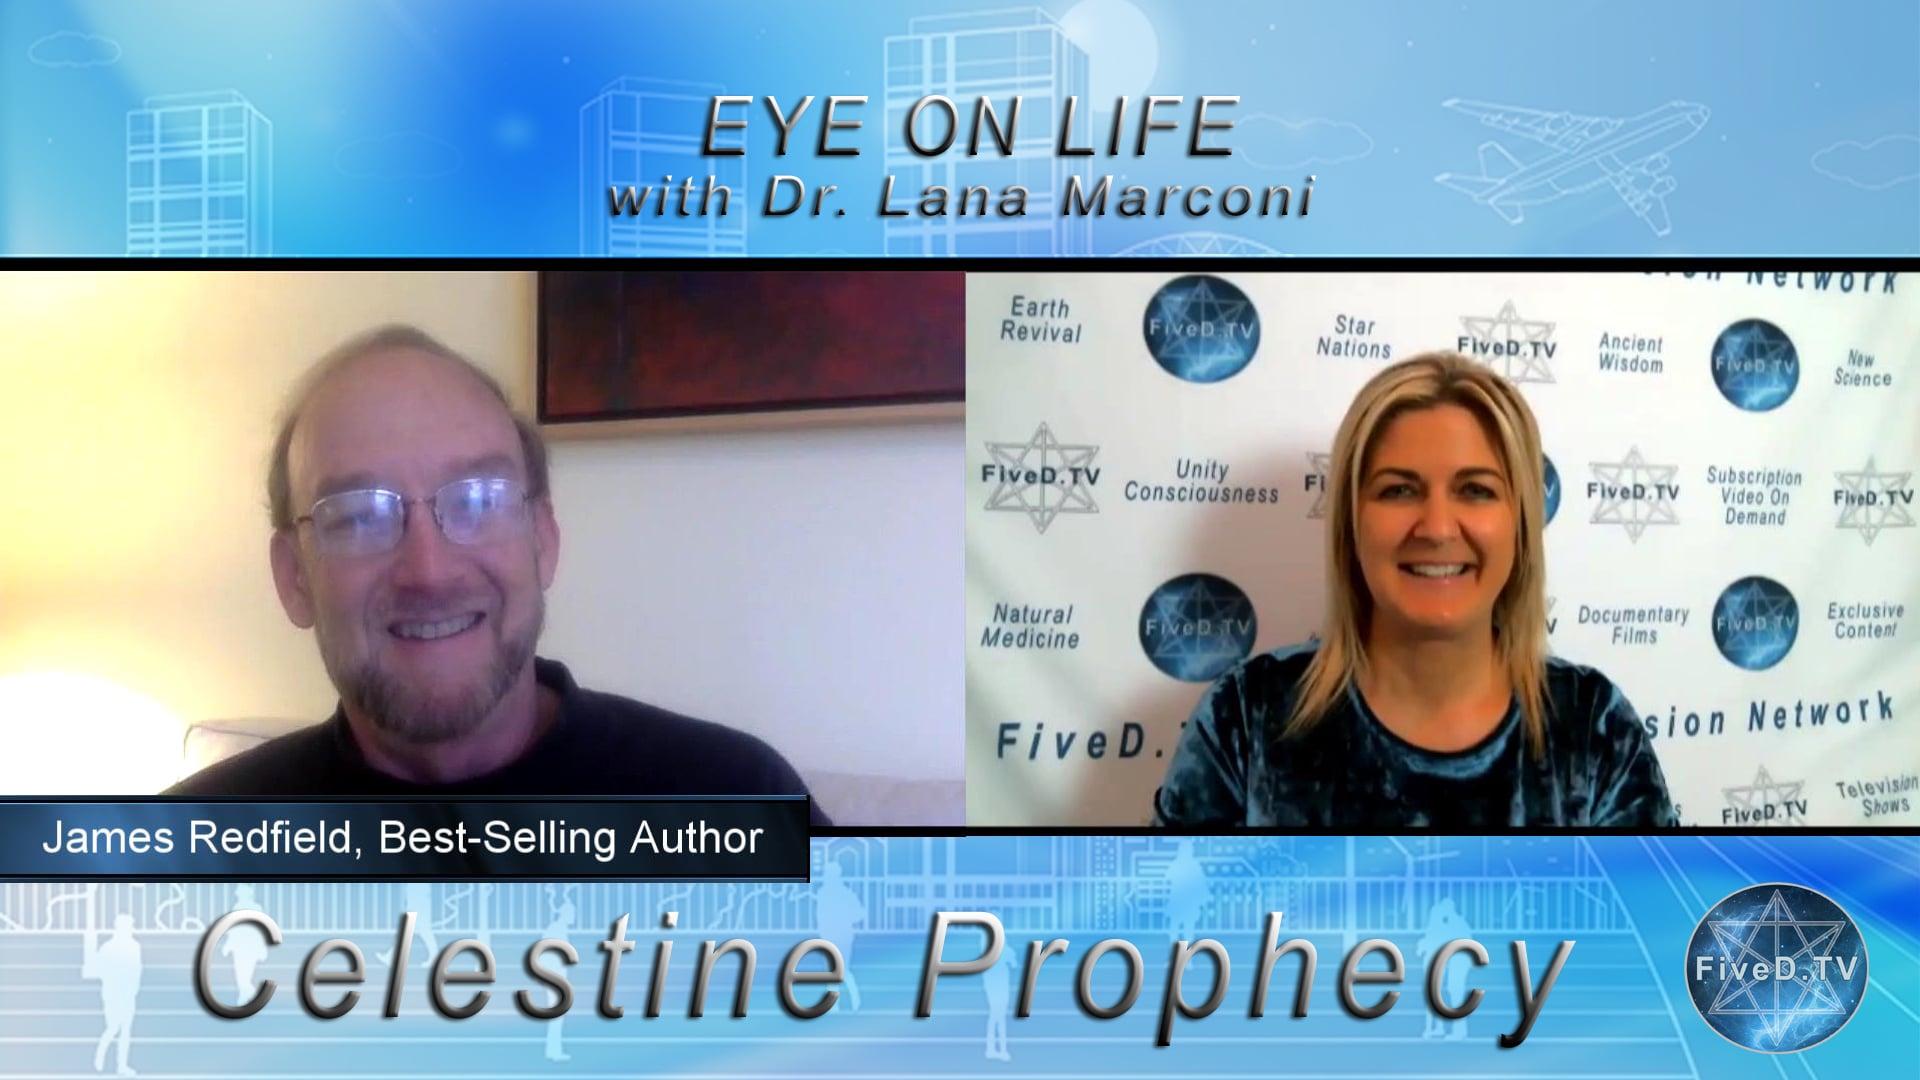 Eye On Life: Celestine Prophecy